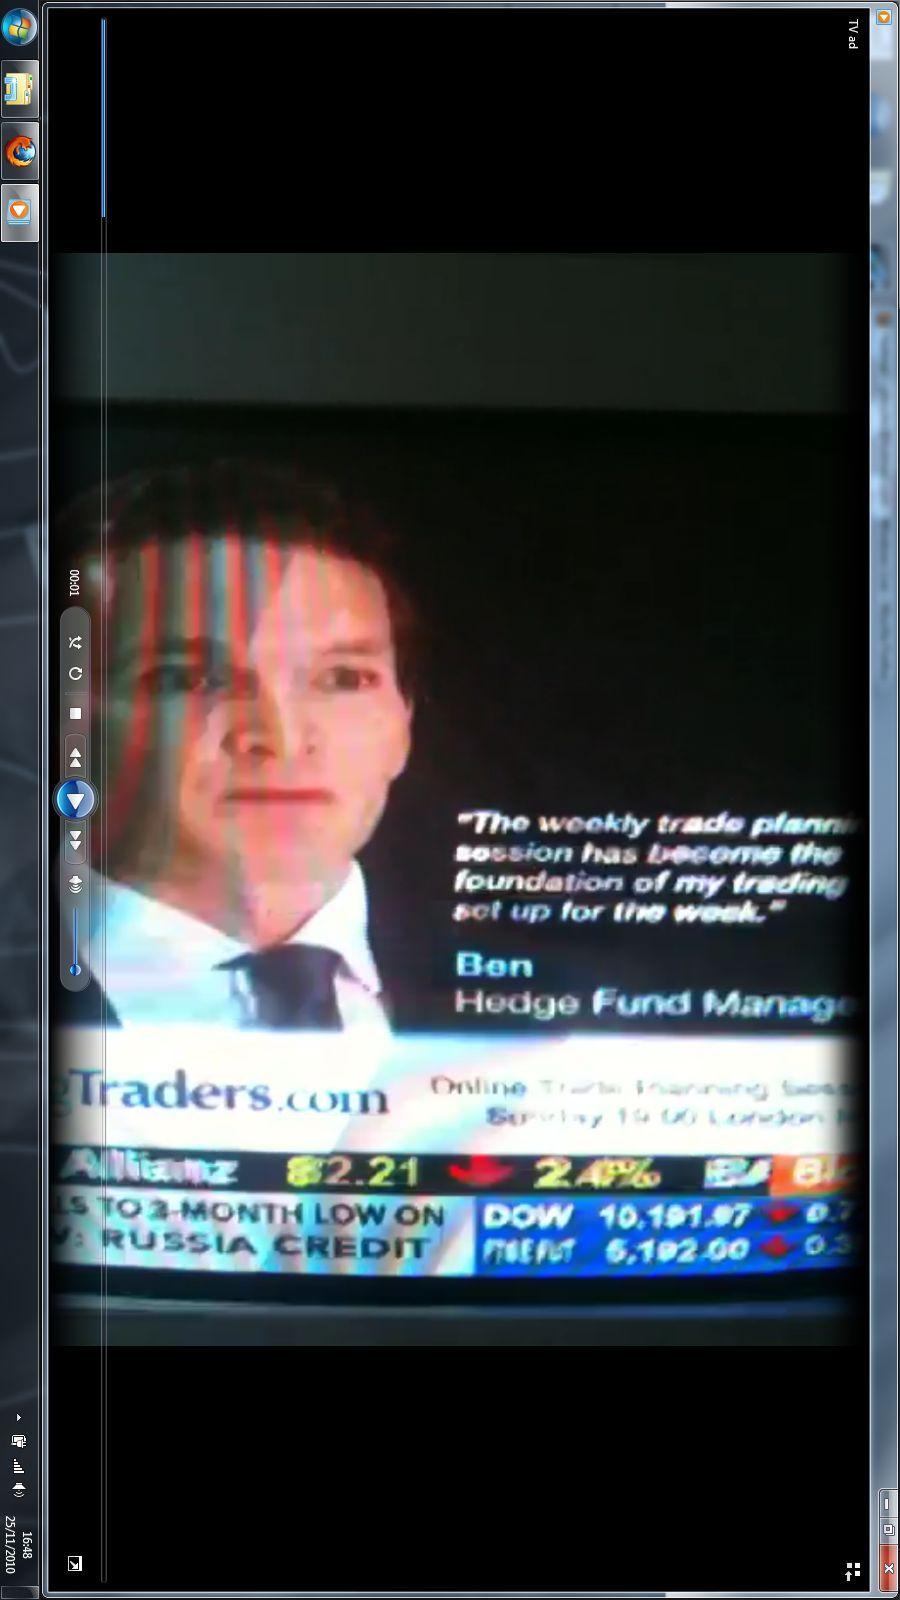 ben-hedge-fund-manager.jpg